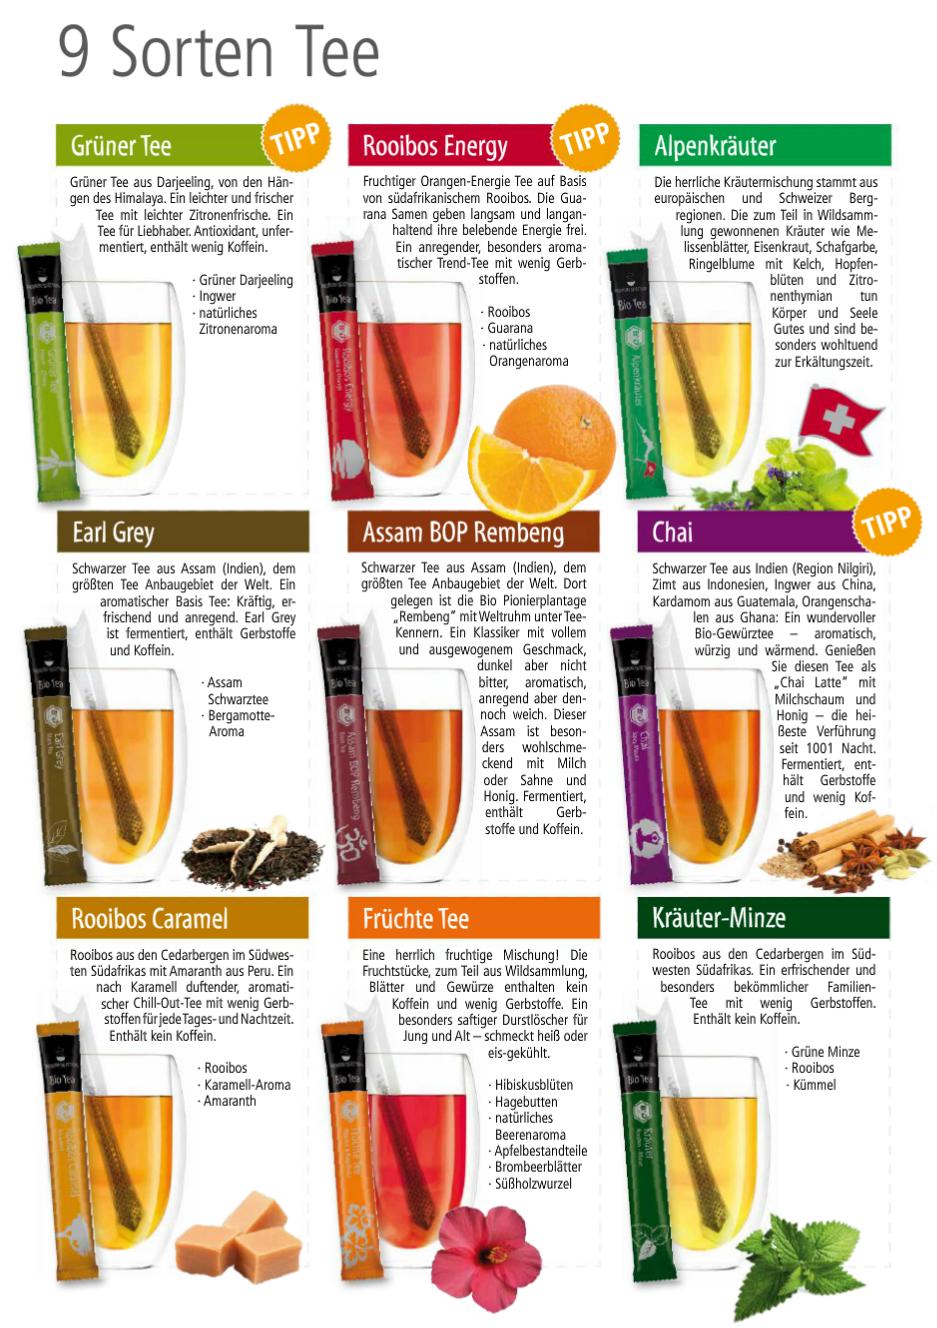 Getr-nke-Bio-TeaStick-Wellness-und-Pflege-2016-2016-09-23-13-02-5757e50ecb0ef9e